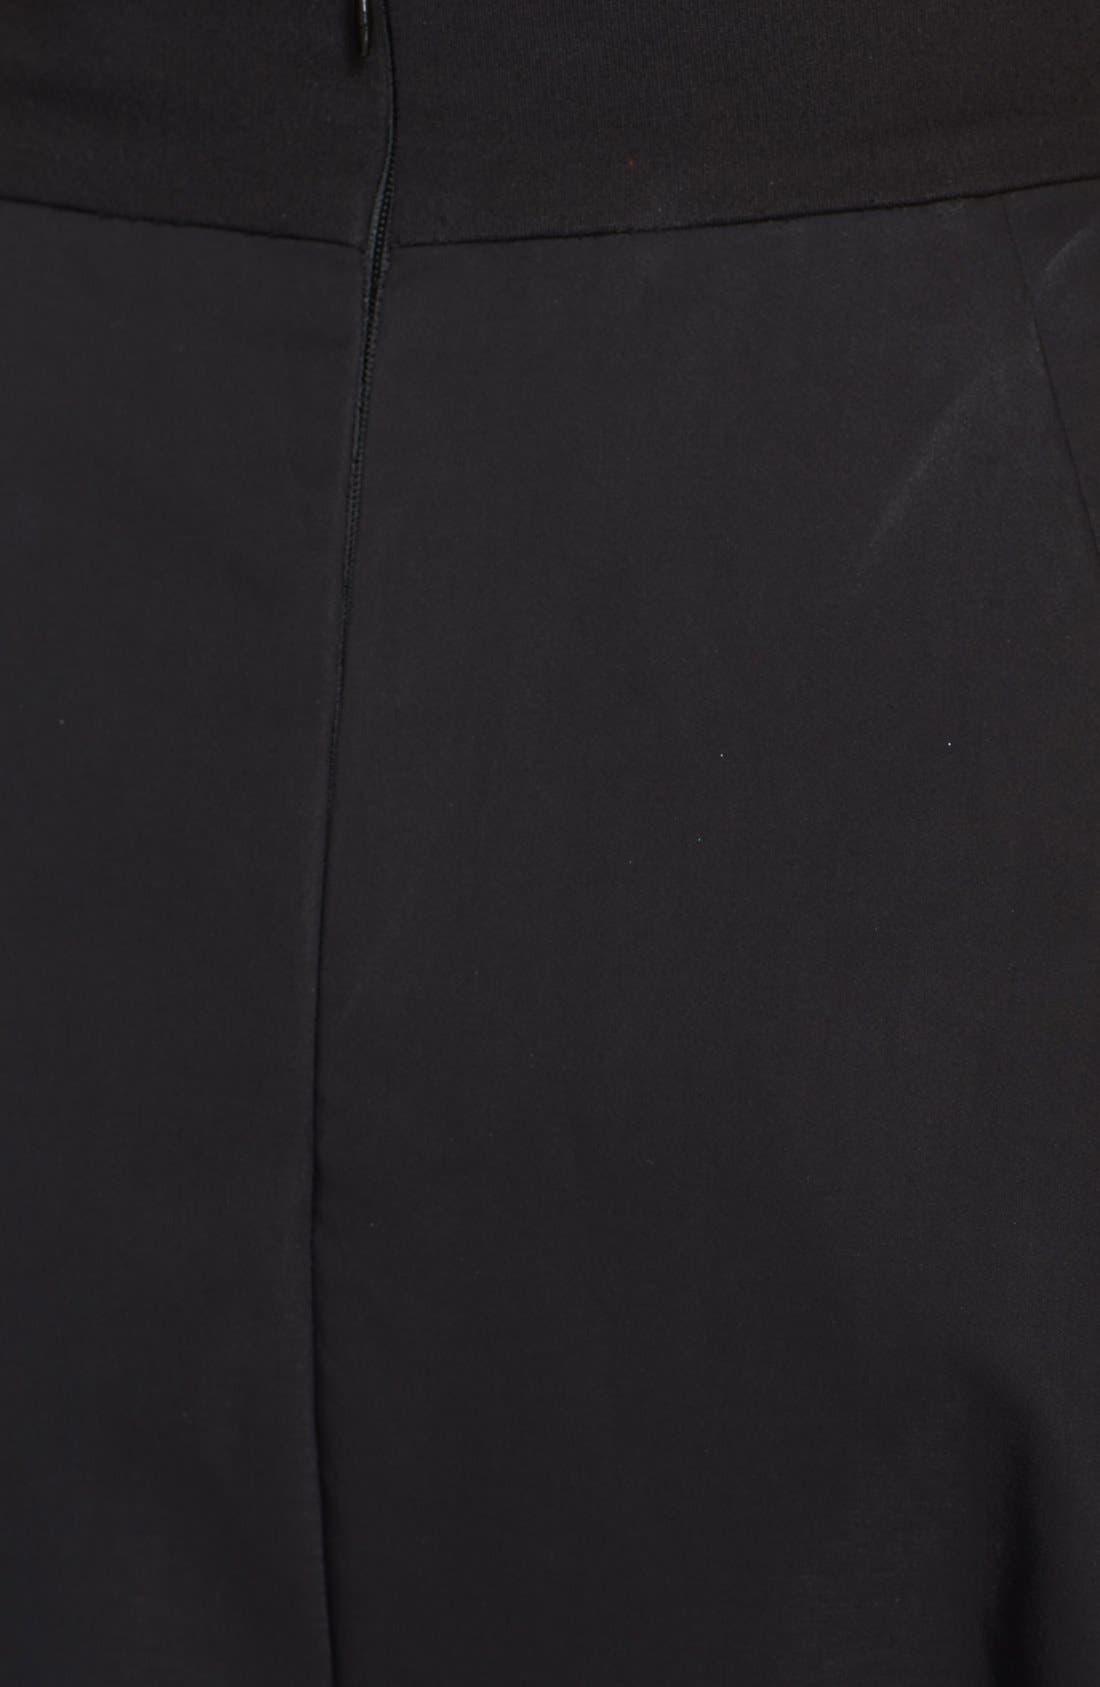 Donna Karan Collection Cotton Taffeta Skirt,                             Alternate thumbnail 2, color,                             001